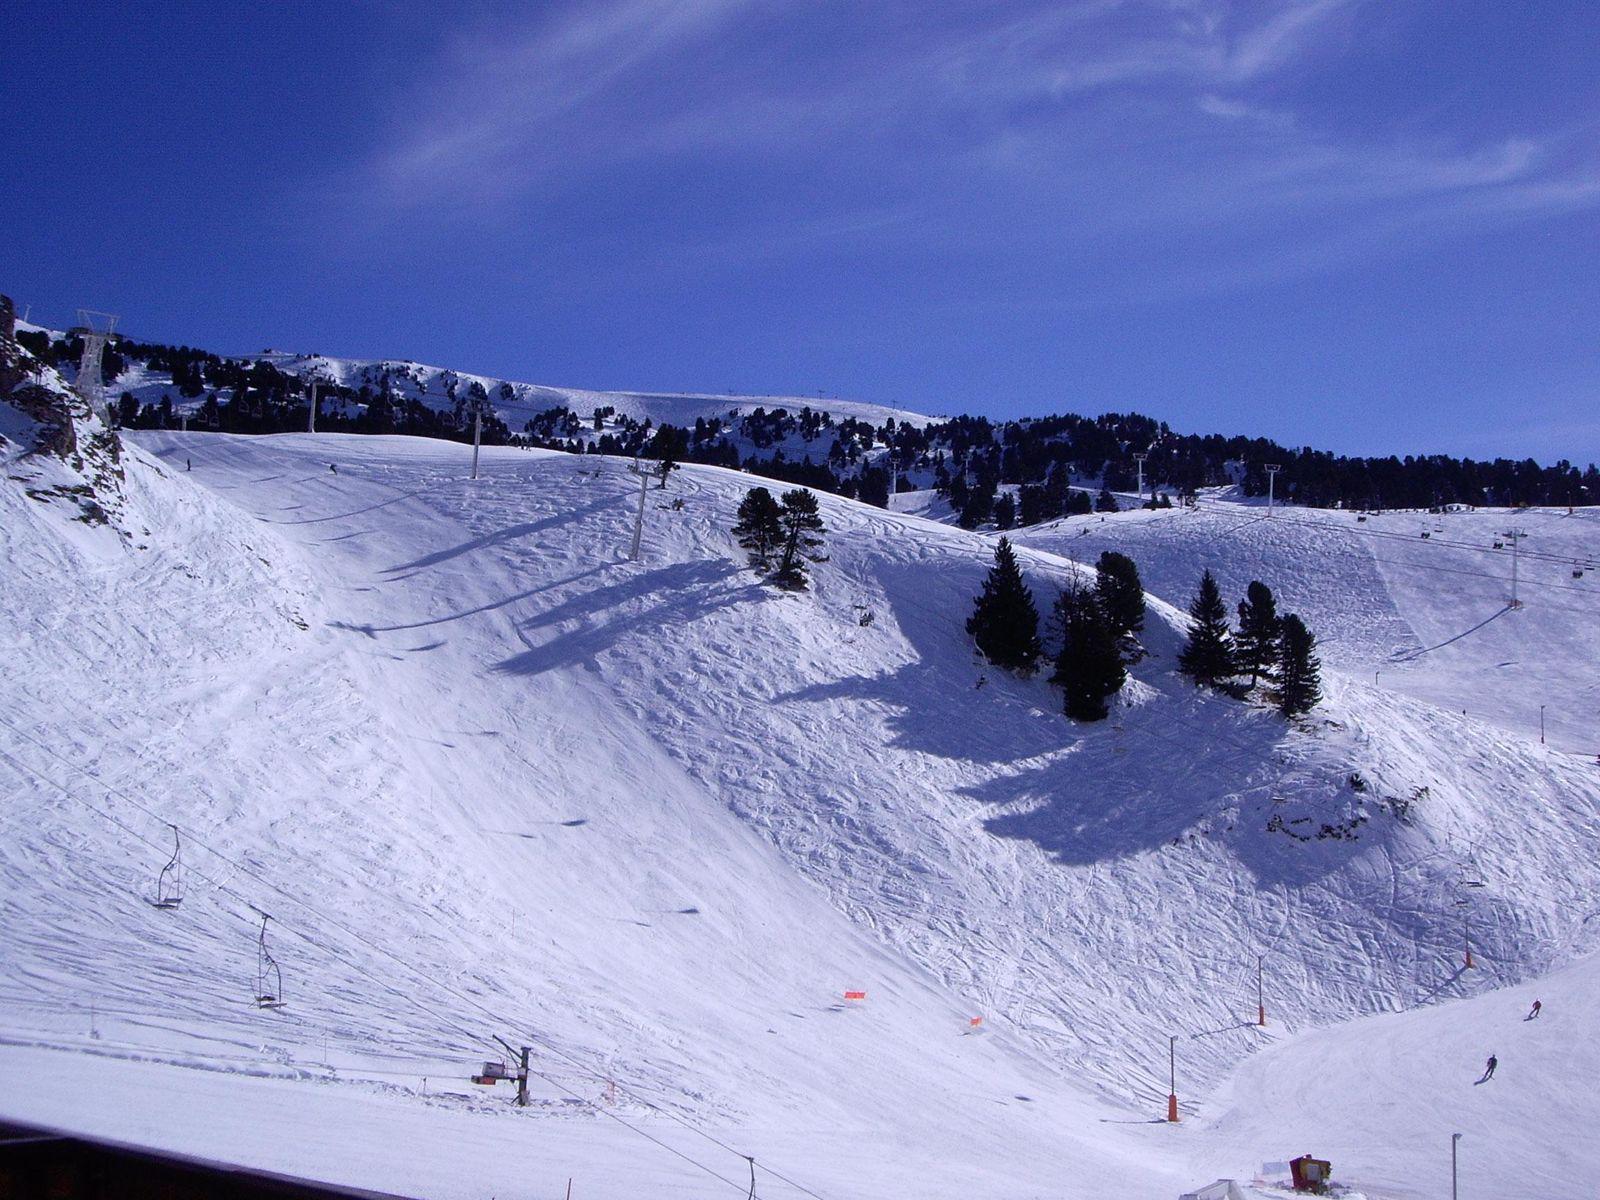 Station de ski de Station de ski deChamrousse_Chamrousse (1)